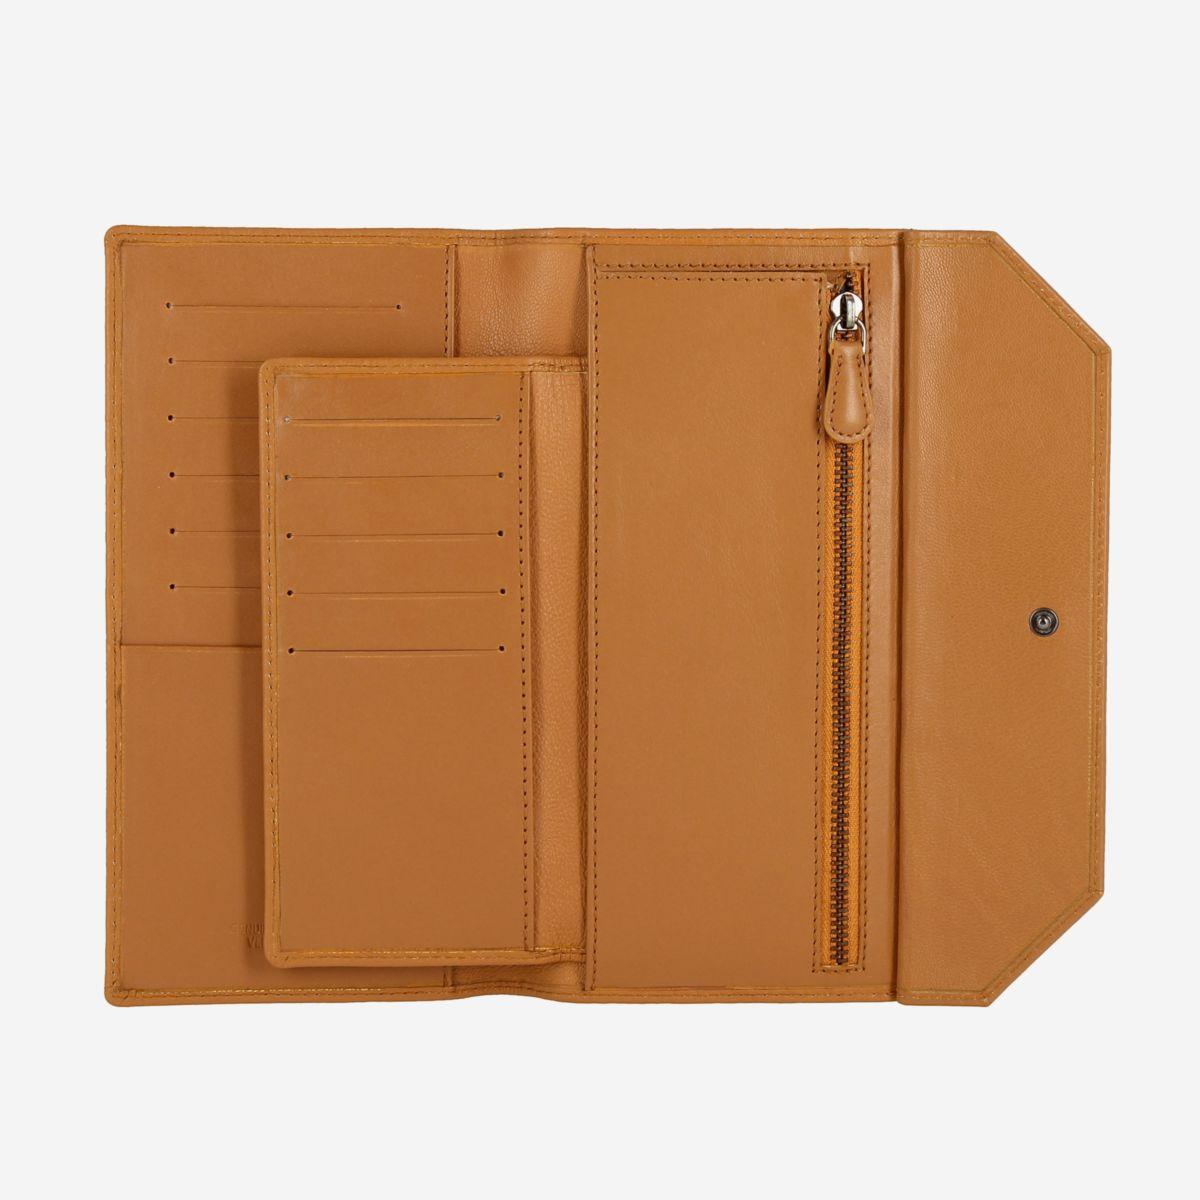 DuDu Ladies Envelope Leather Clutch Wallet Purse  - Buff